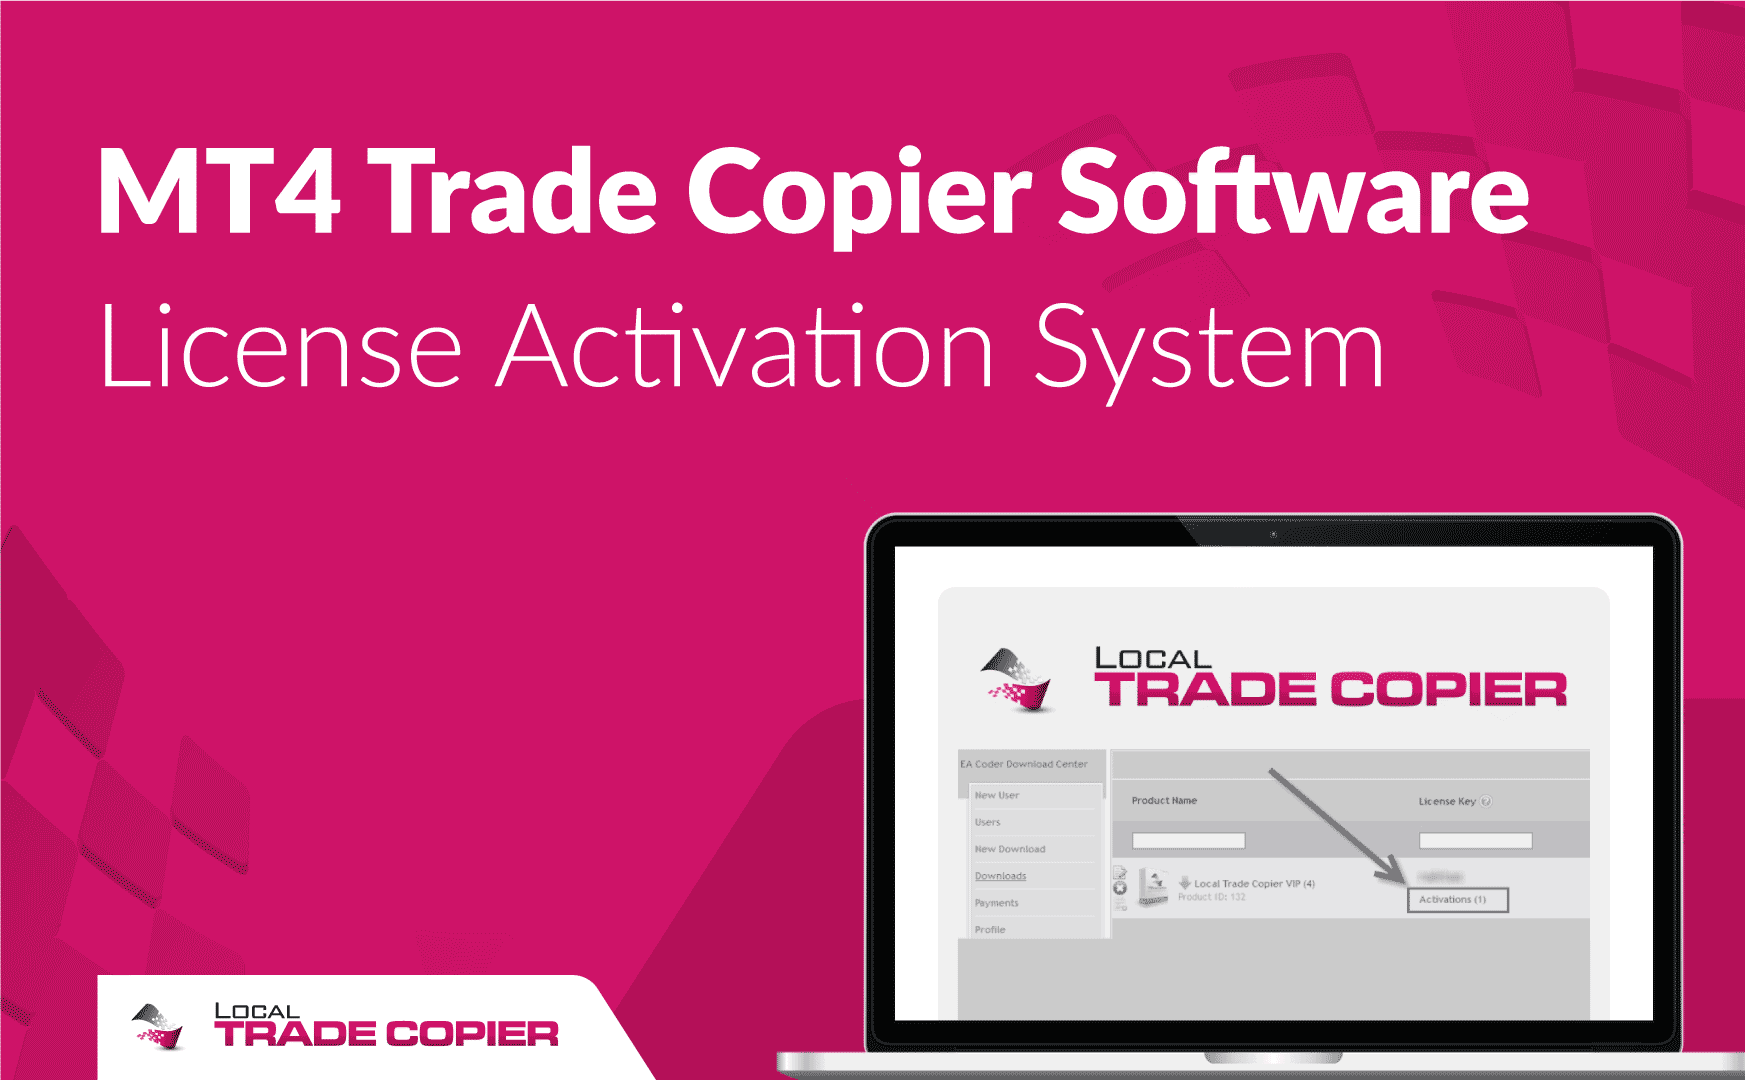 MT4 Trade Copier Software License Activation System